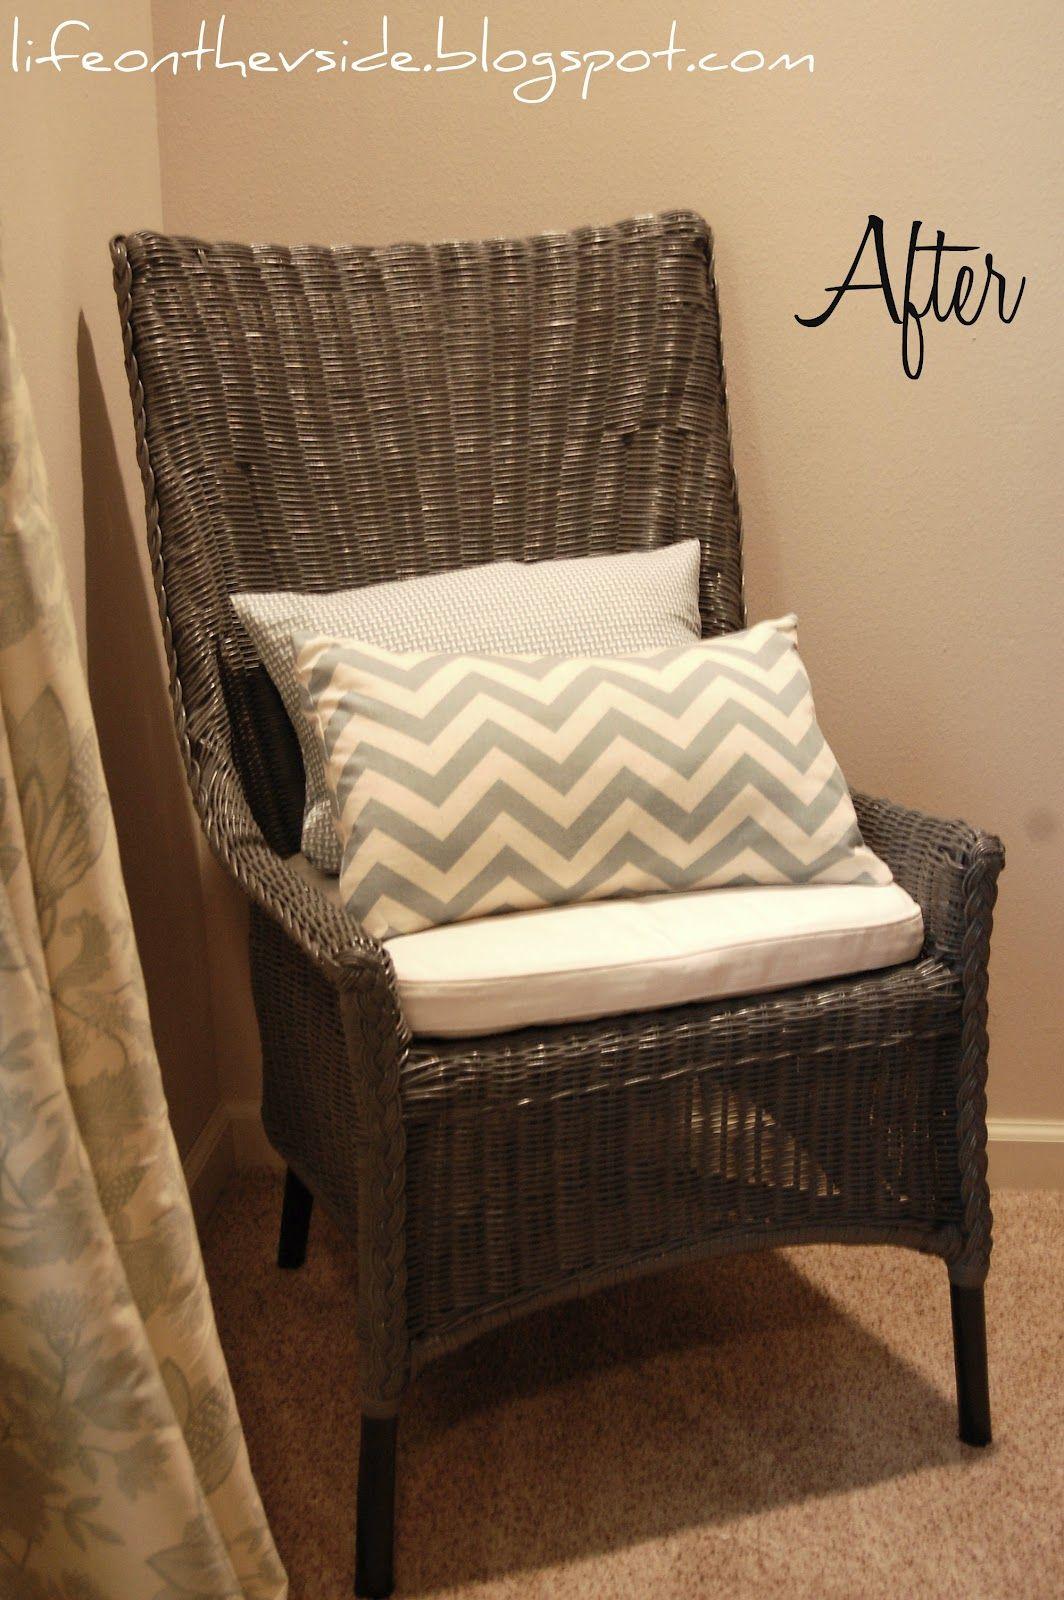 wicker chair makeover rustoleum granite minwax dark walnut on the legs